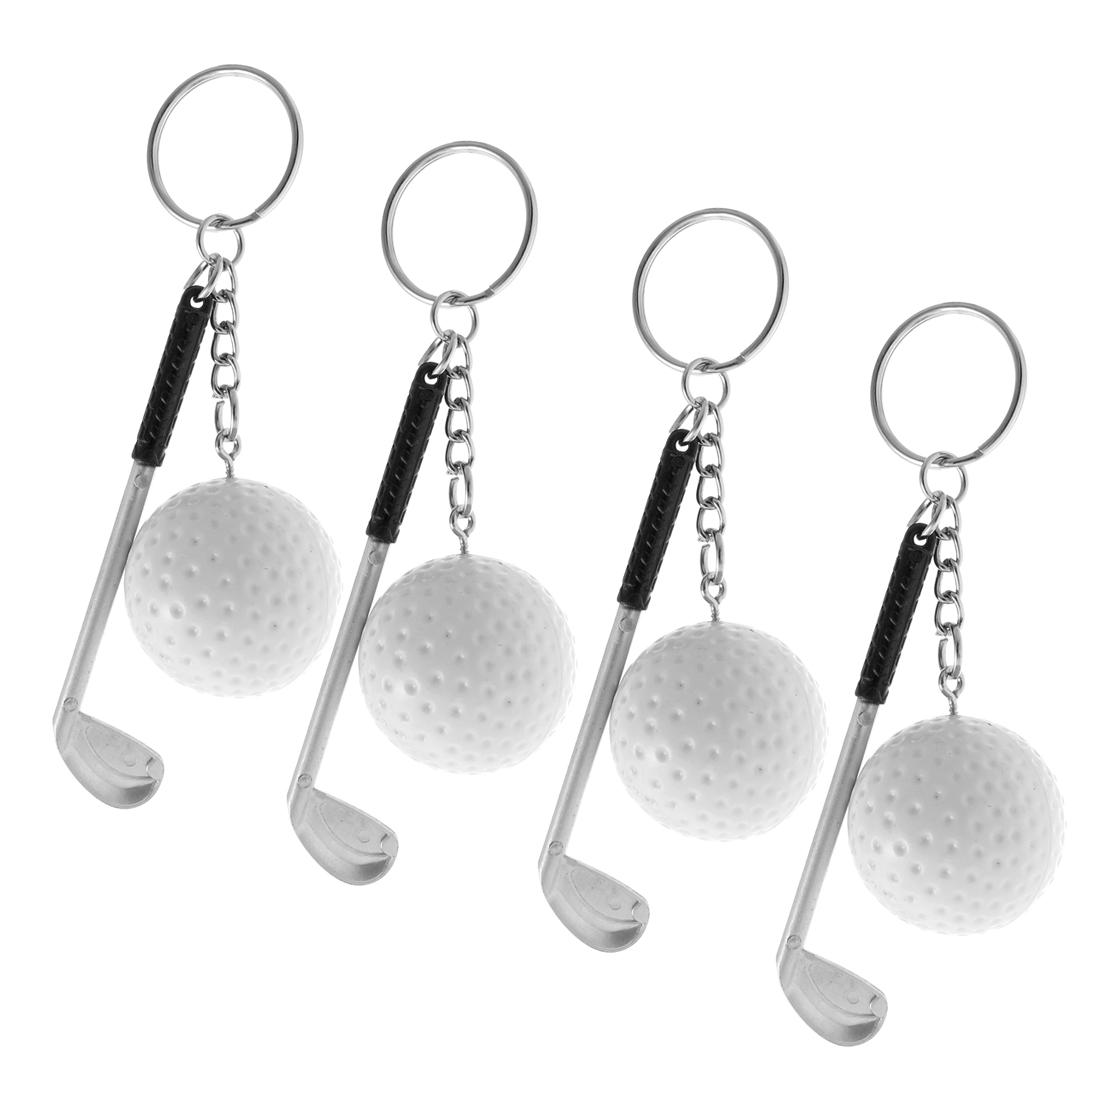 4PCS White Plastic Golf Ball Stick Pendant Keychain Keyring Key Chain Ring Purse Handbag Ornament